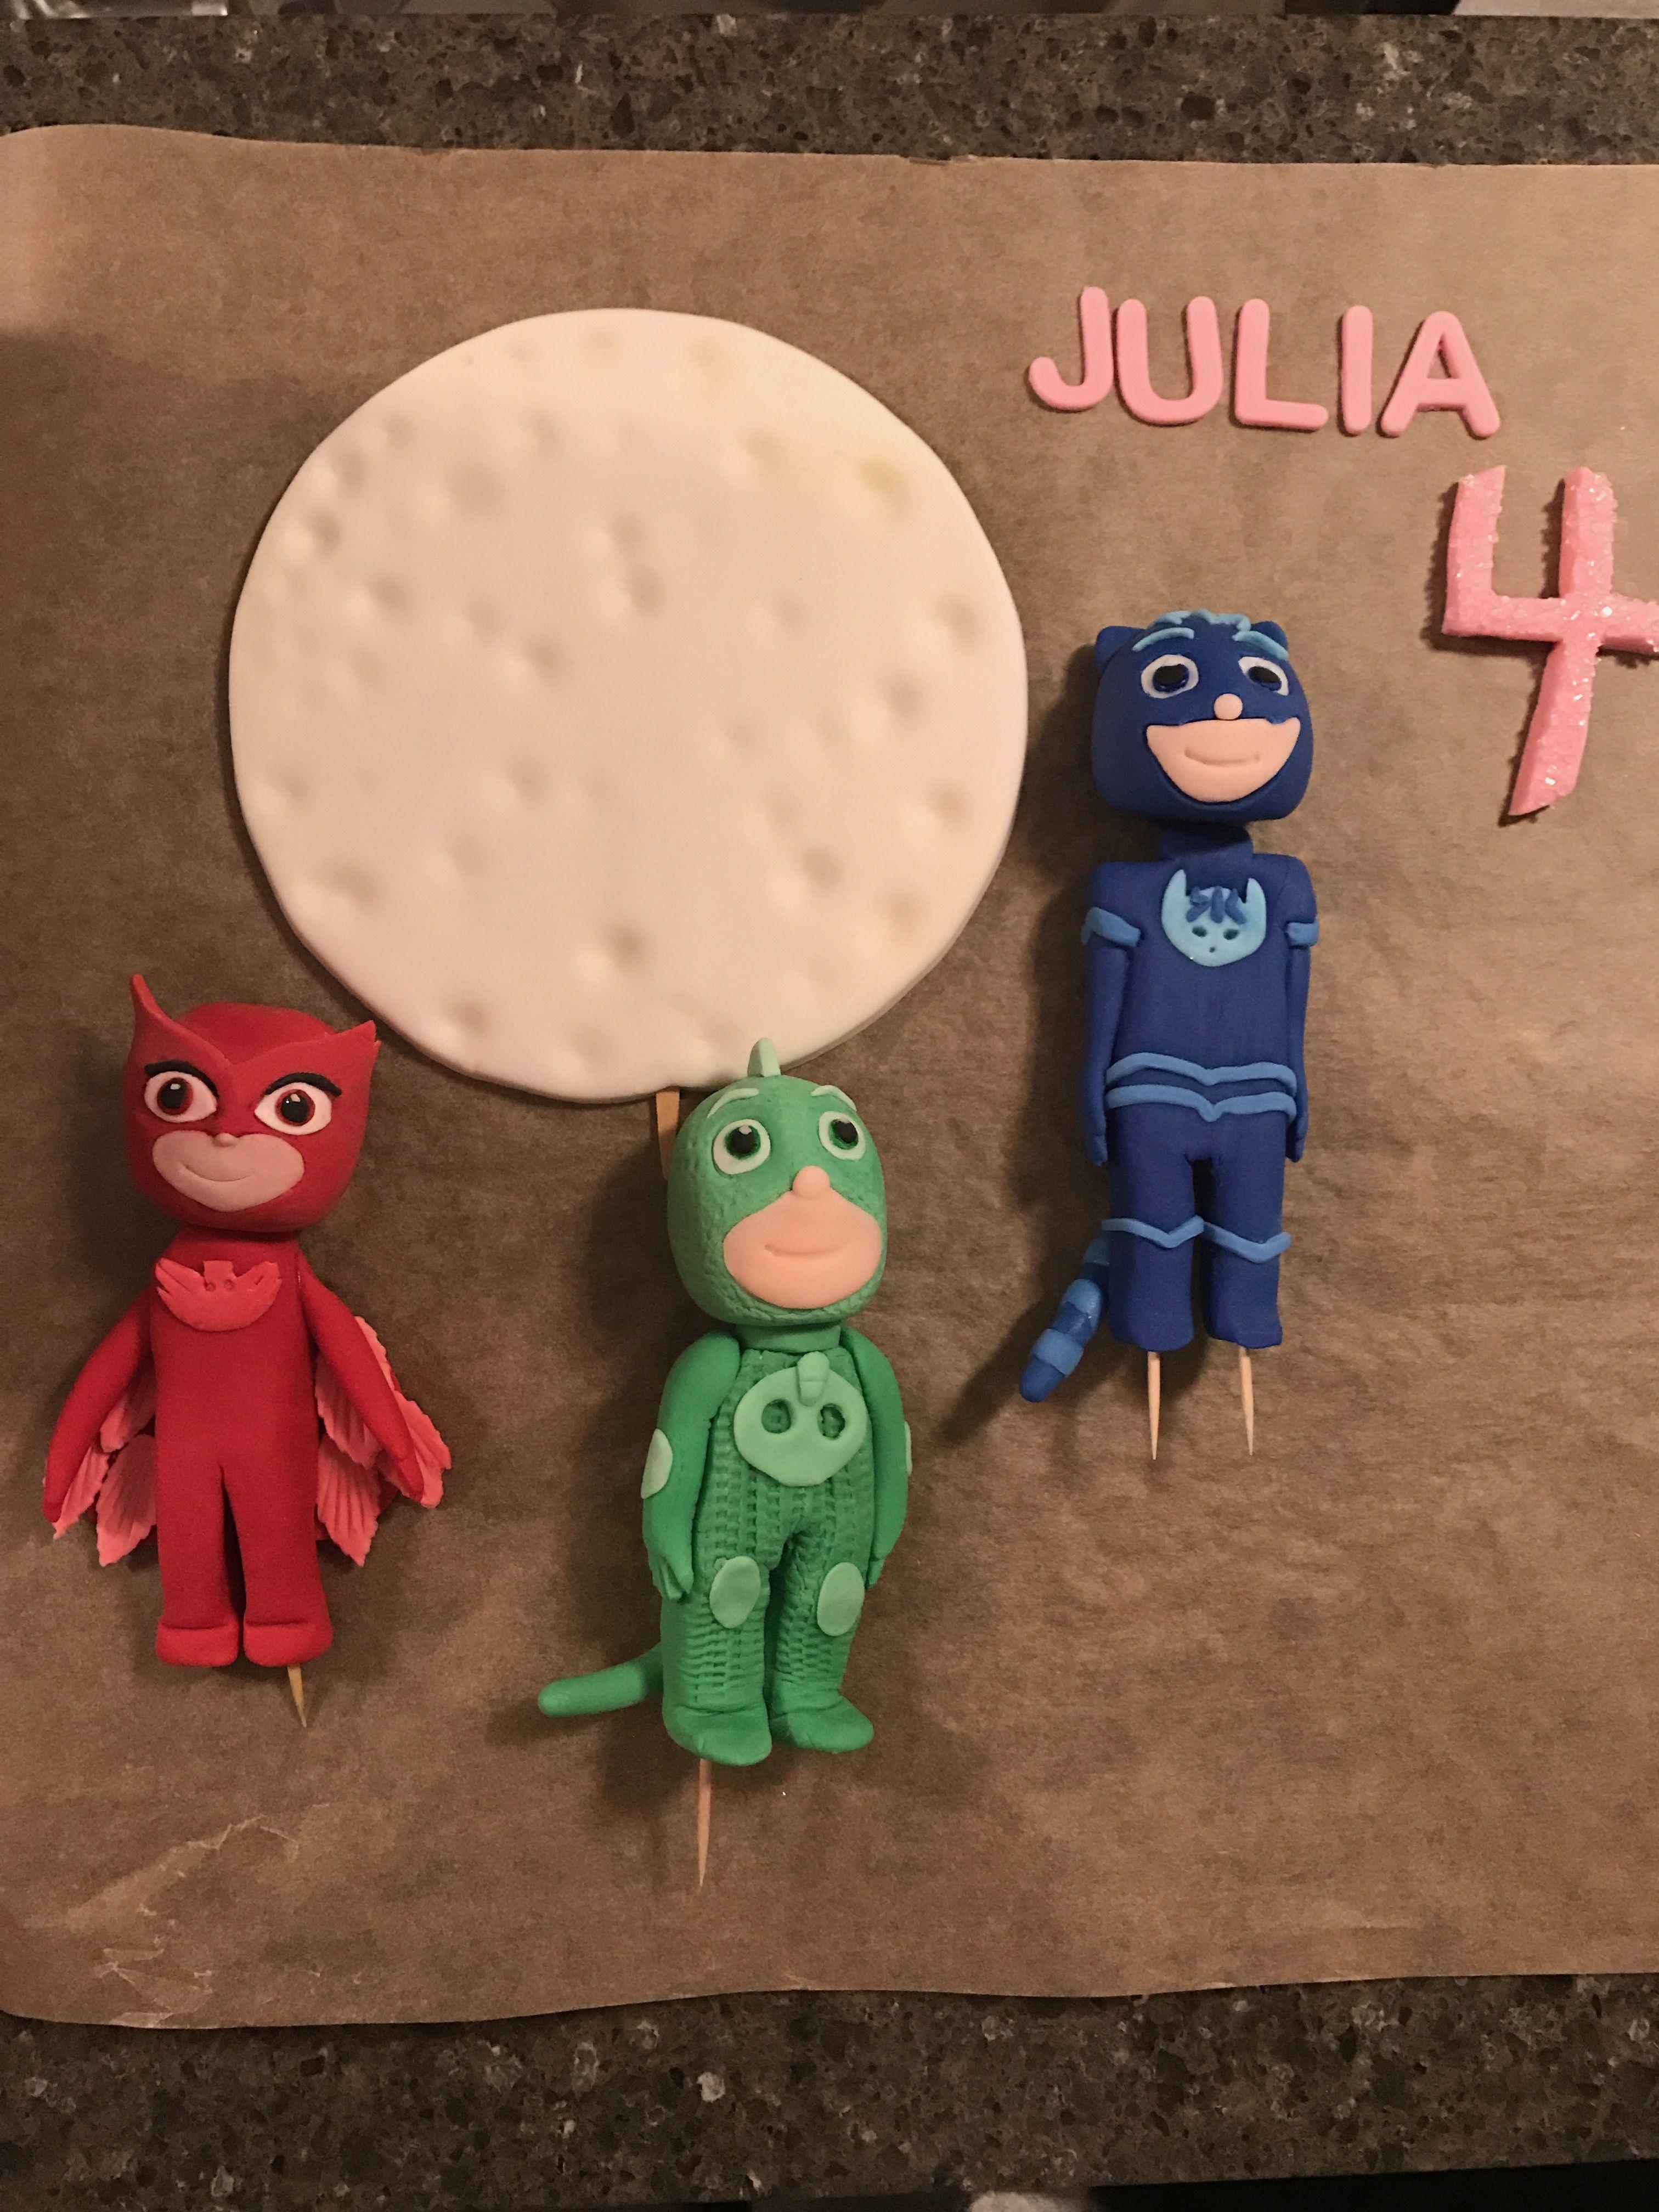 Owlette catboy gekko pj masks fondant cake toppers